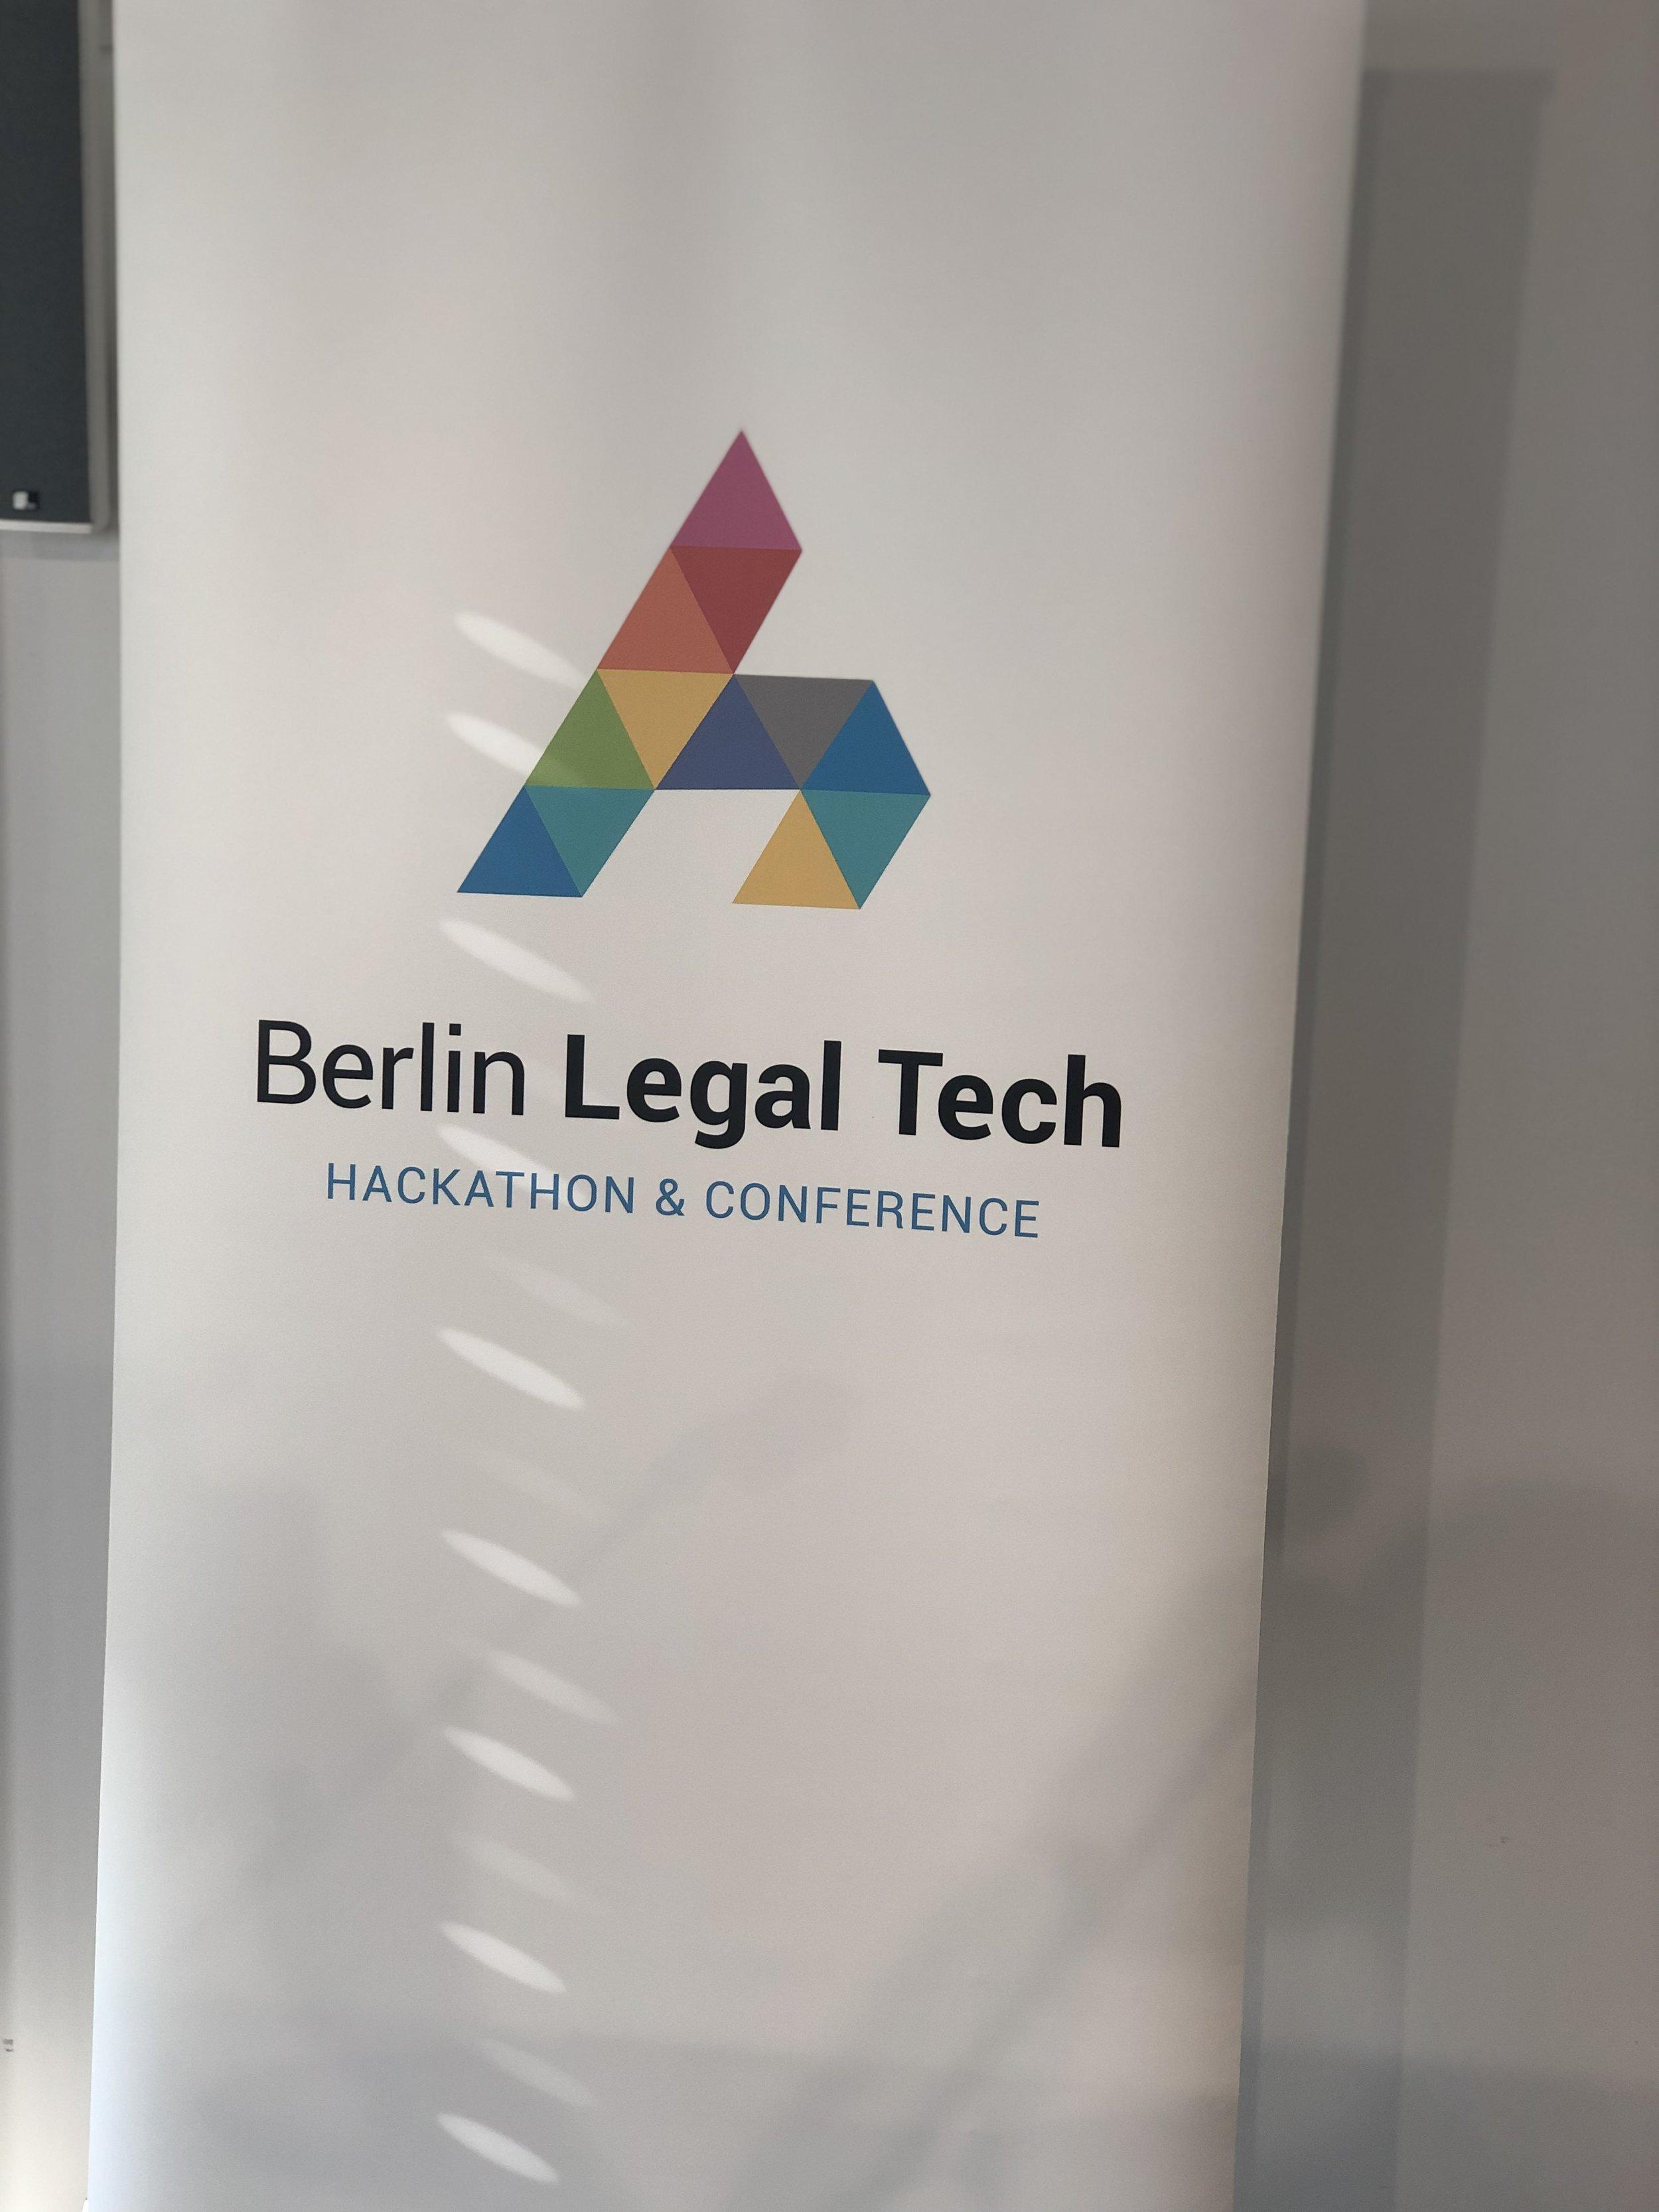 plusYOU @ LegalTechBerlin 2019